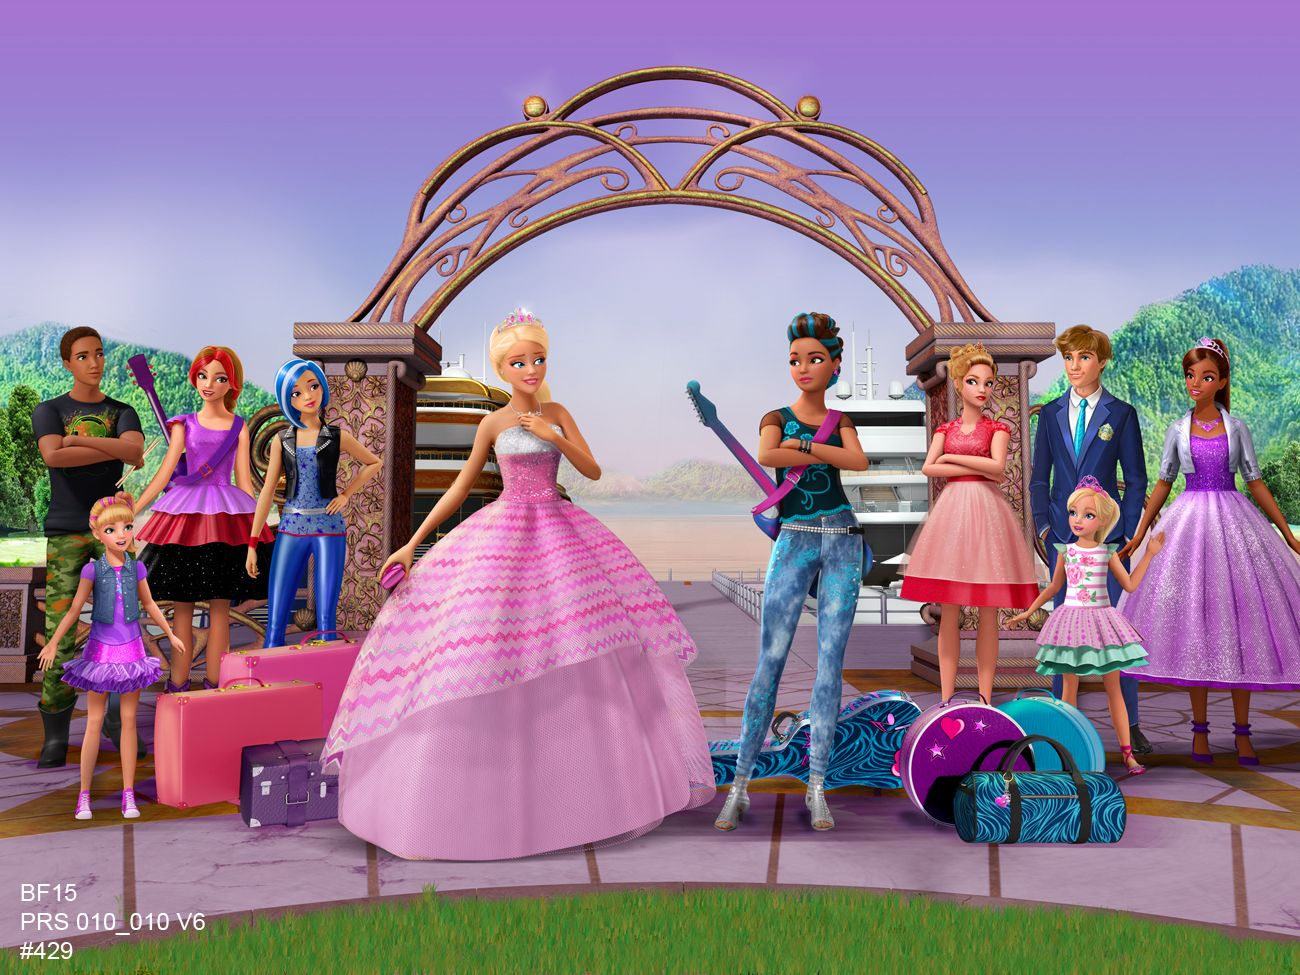 Barbie in Rockn Royals  Princess Courtney and Erika Juno